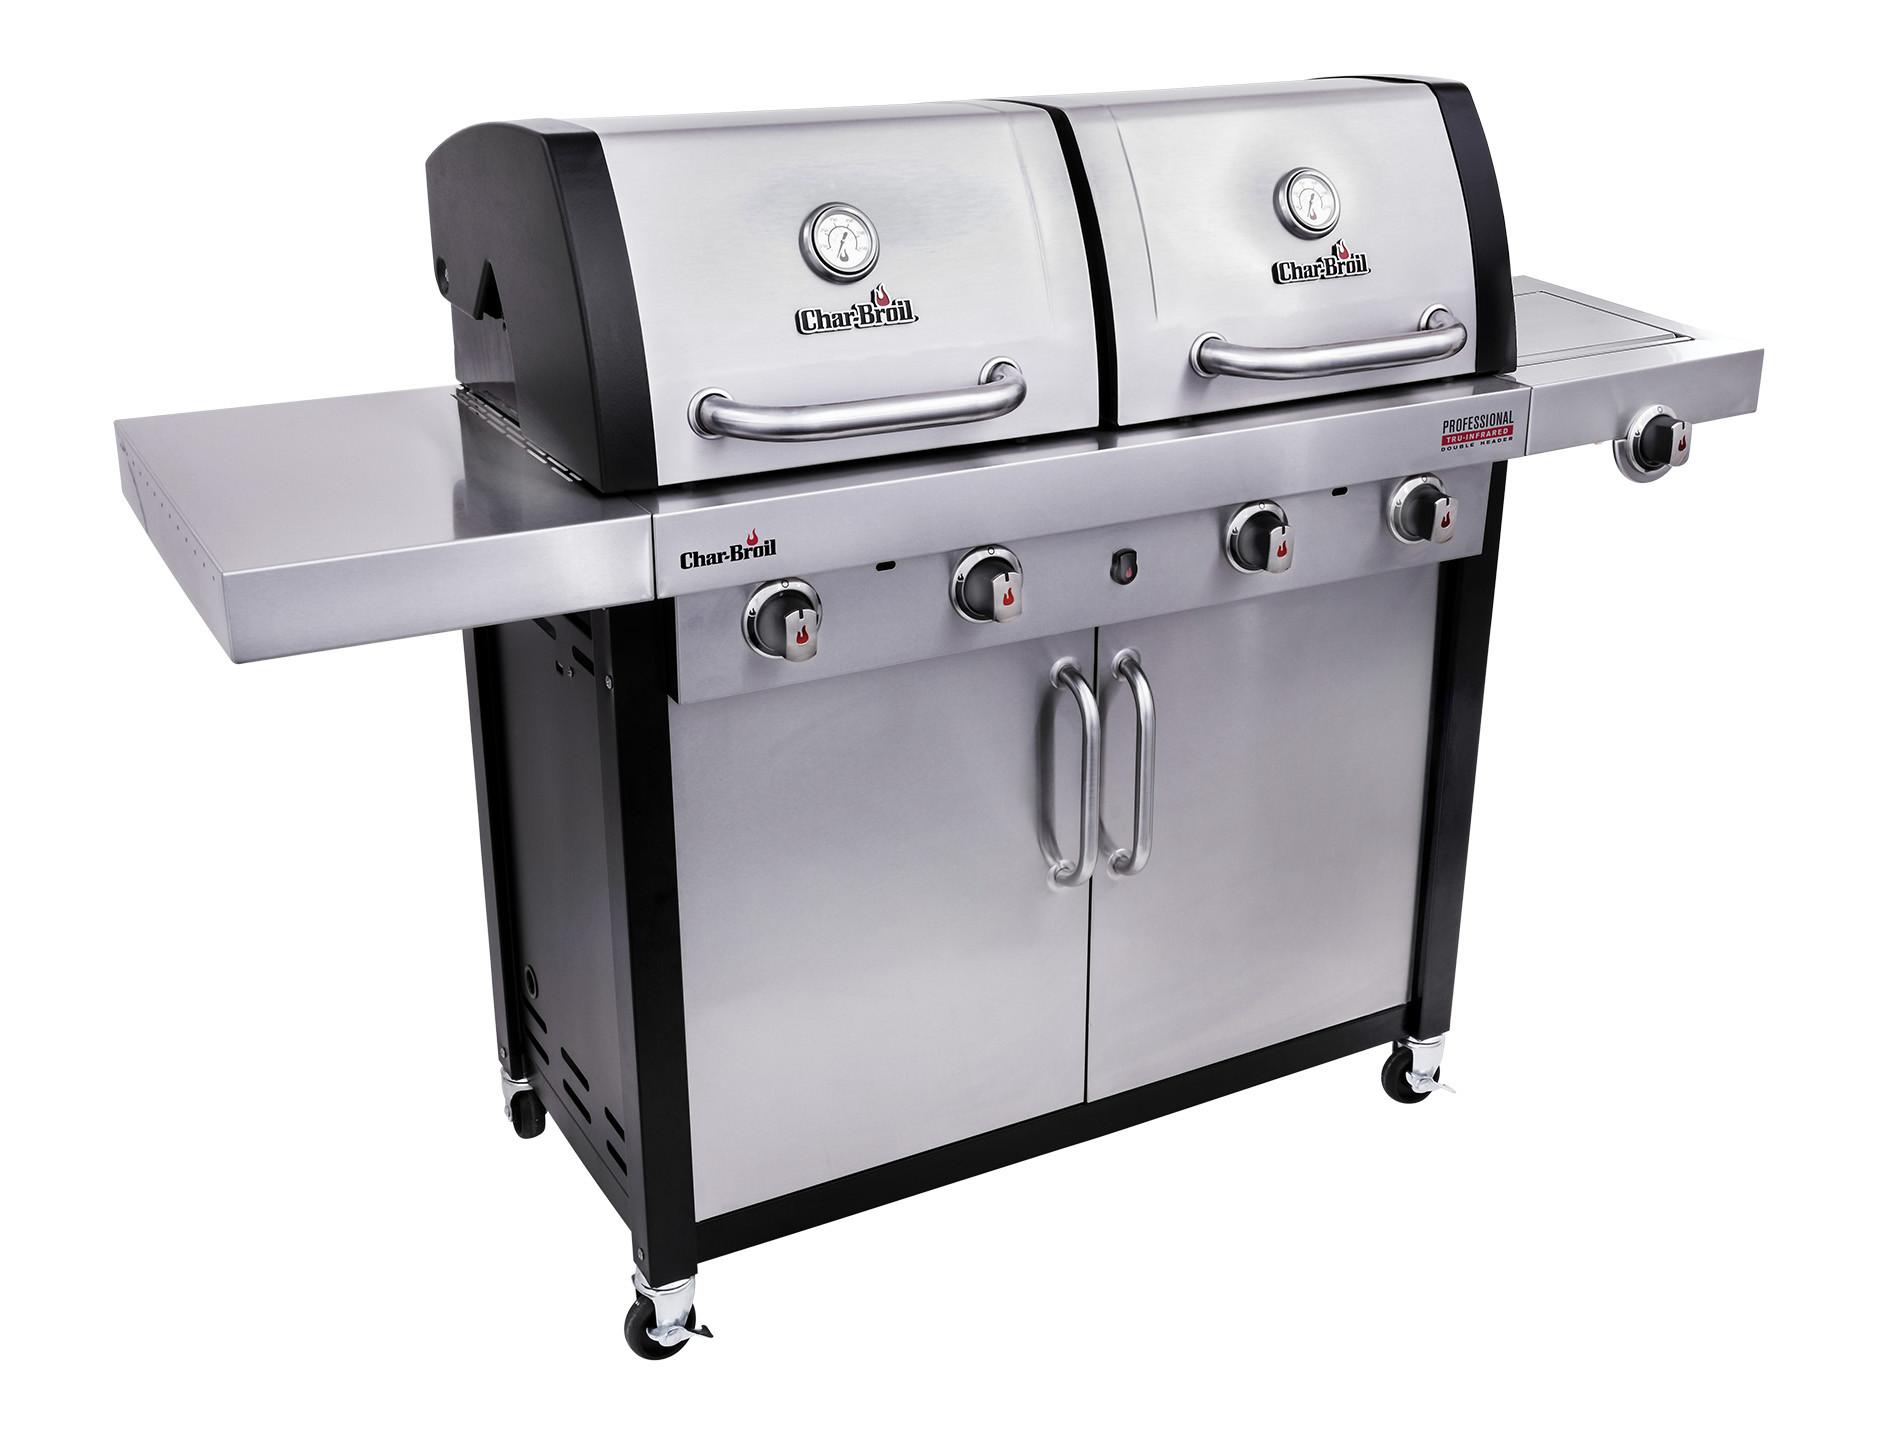 Barbecue Gaz Et Plancha barbecue gaz professional char-broil® 4600s - barbecue